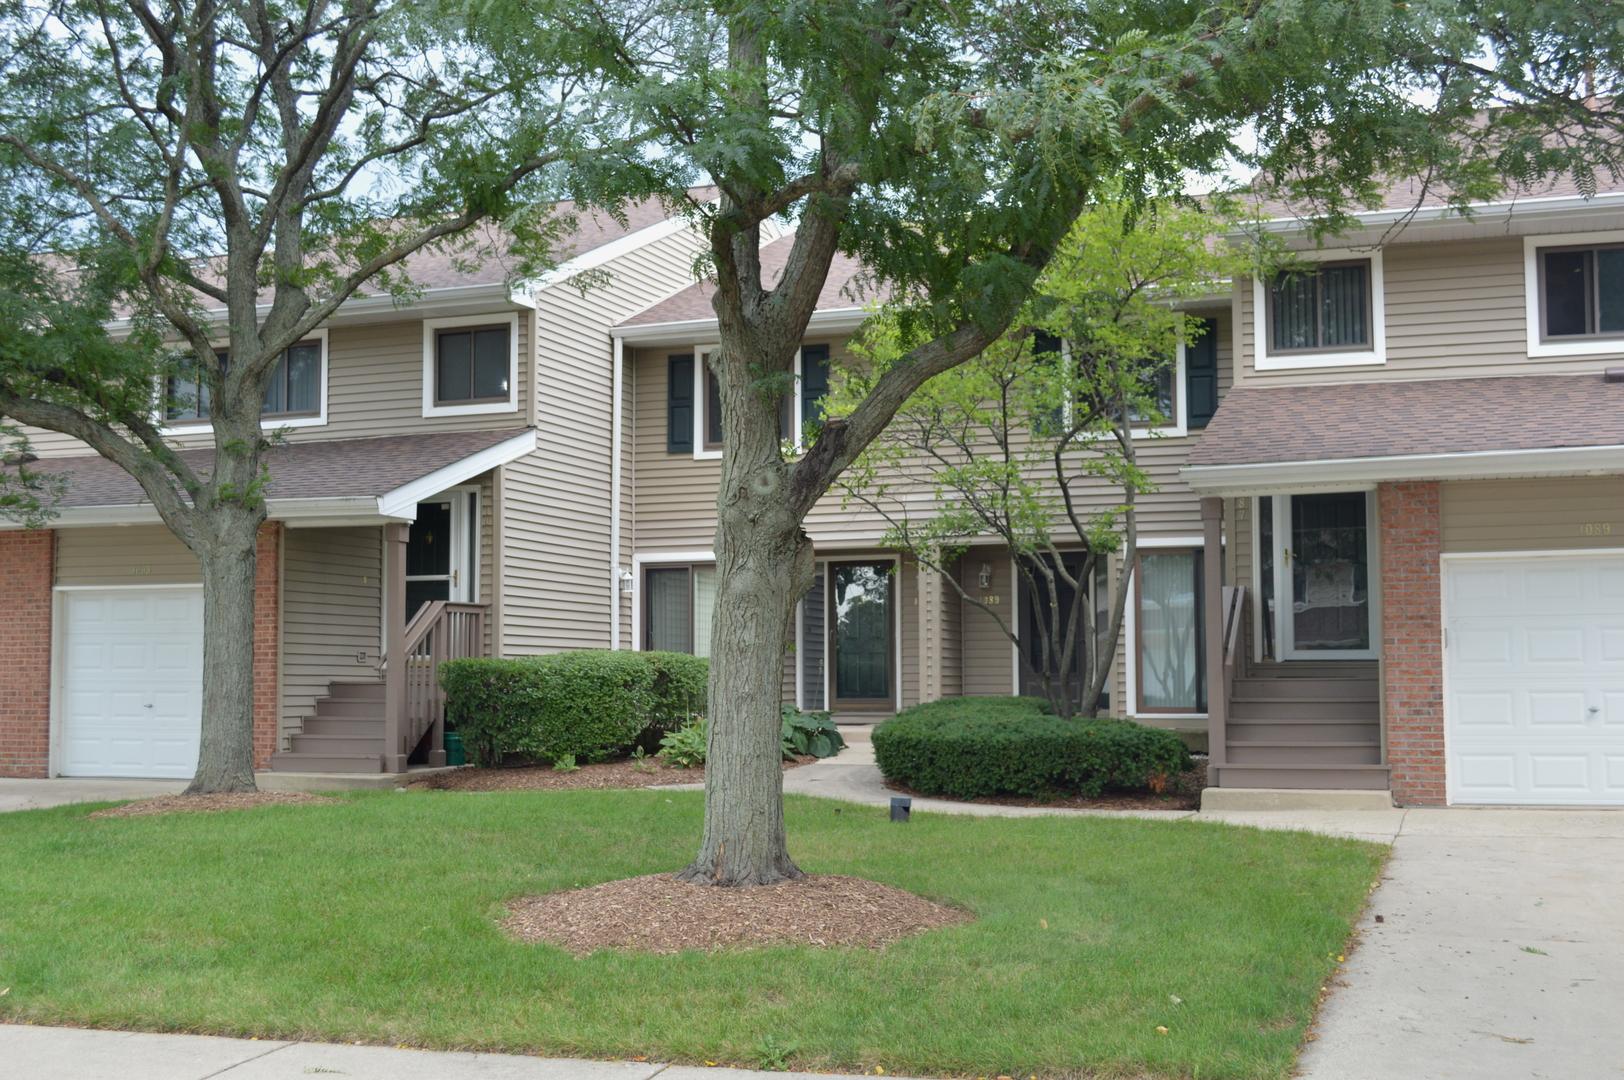 1089 Hidden Lake Drive, Unit 1089, Buffalo Grove, Illinois 60089